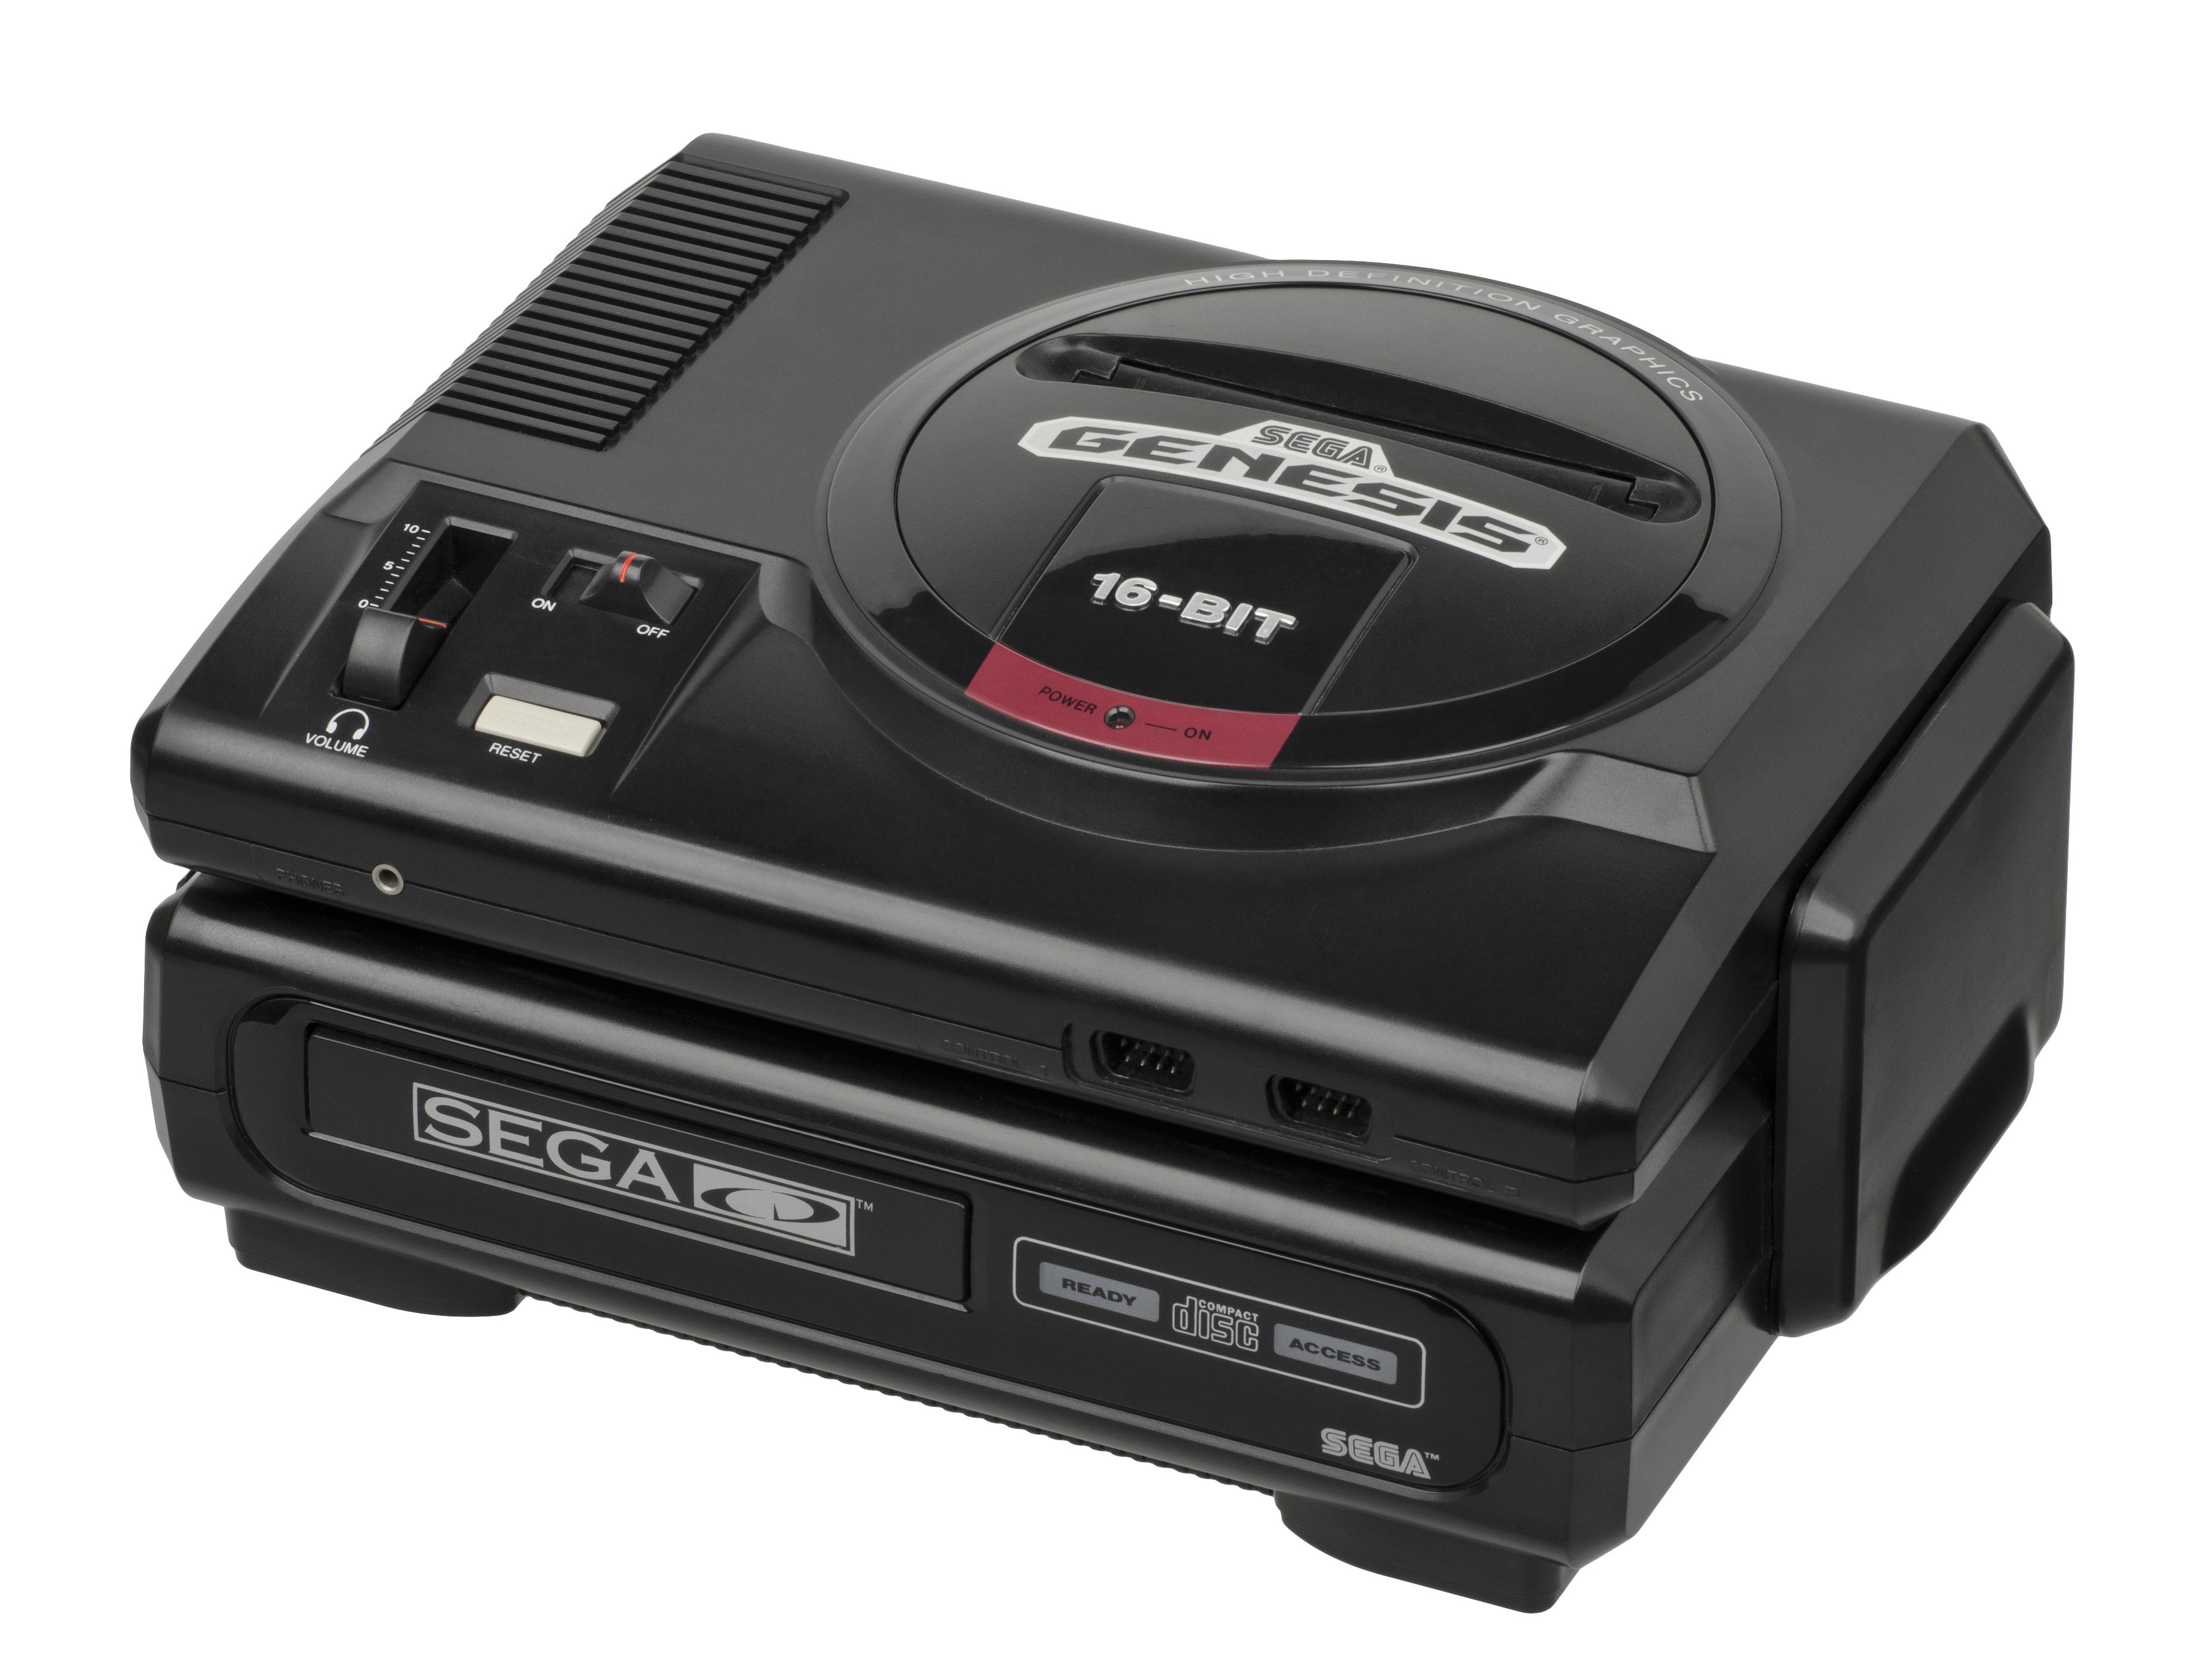 Sega-CD-Model1-Set.jpg